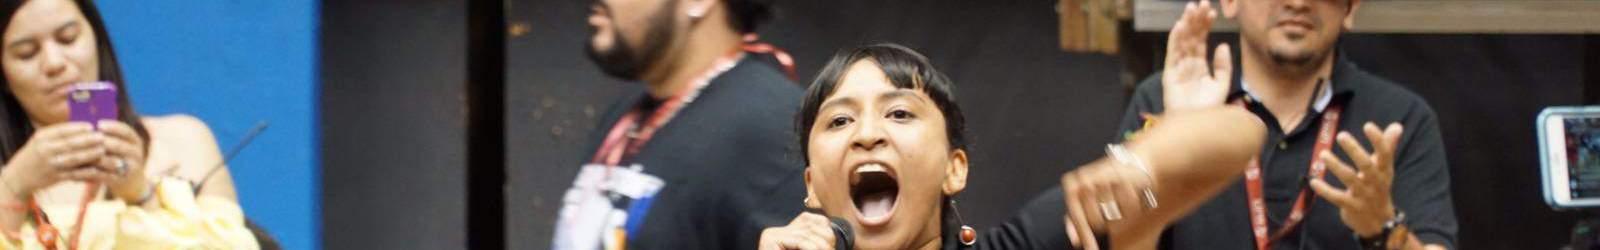 "Asamblea Nacional solicita renuncia ""inmediata"" de presidenta interina UPR"